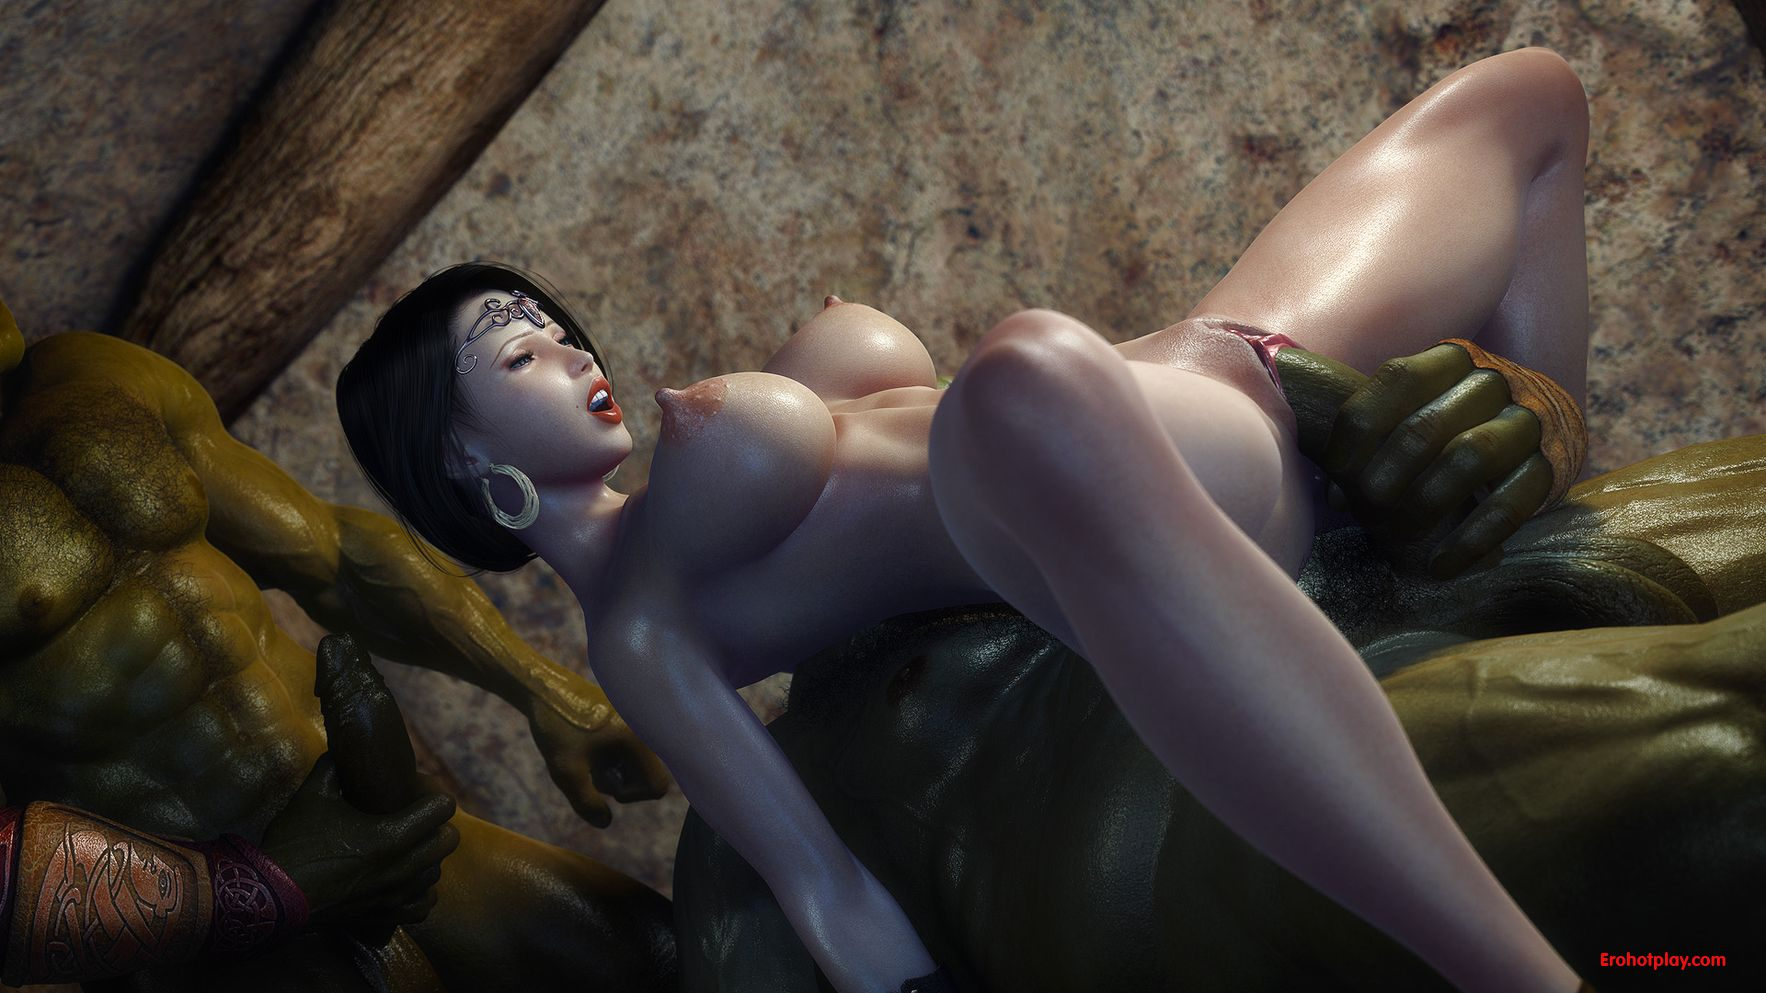 Sex sunmon night swordcrafi story lynn hentai  xxx photos